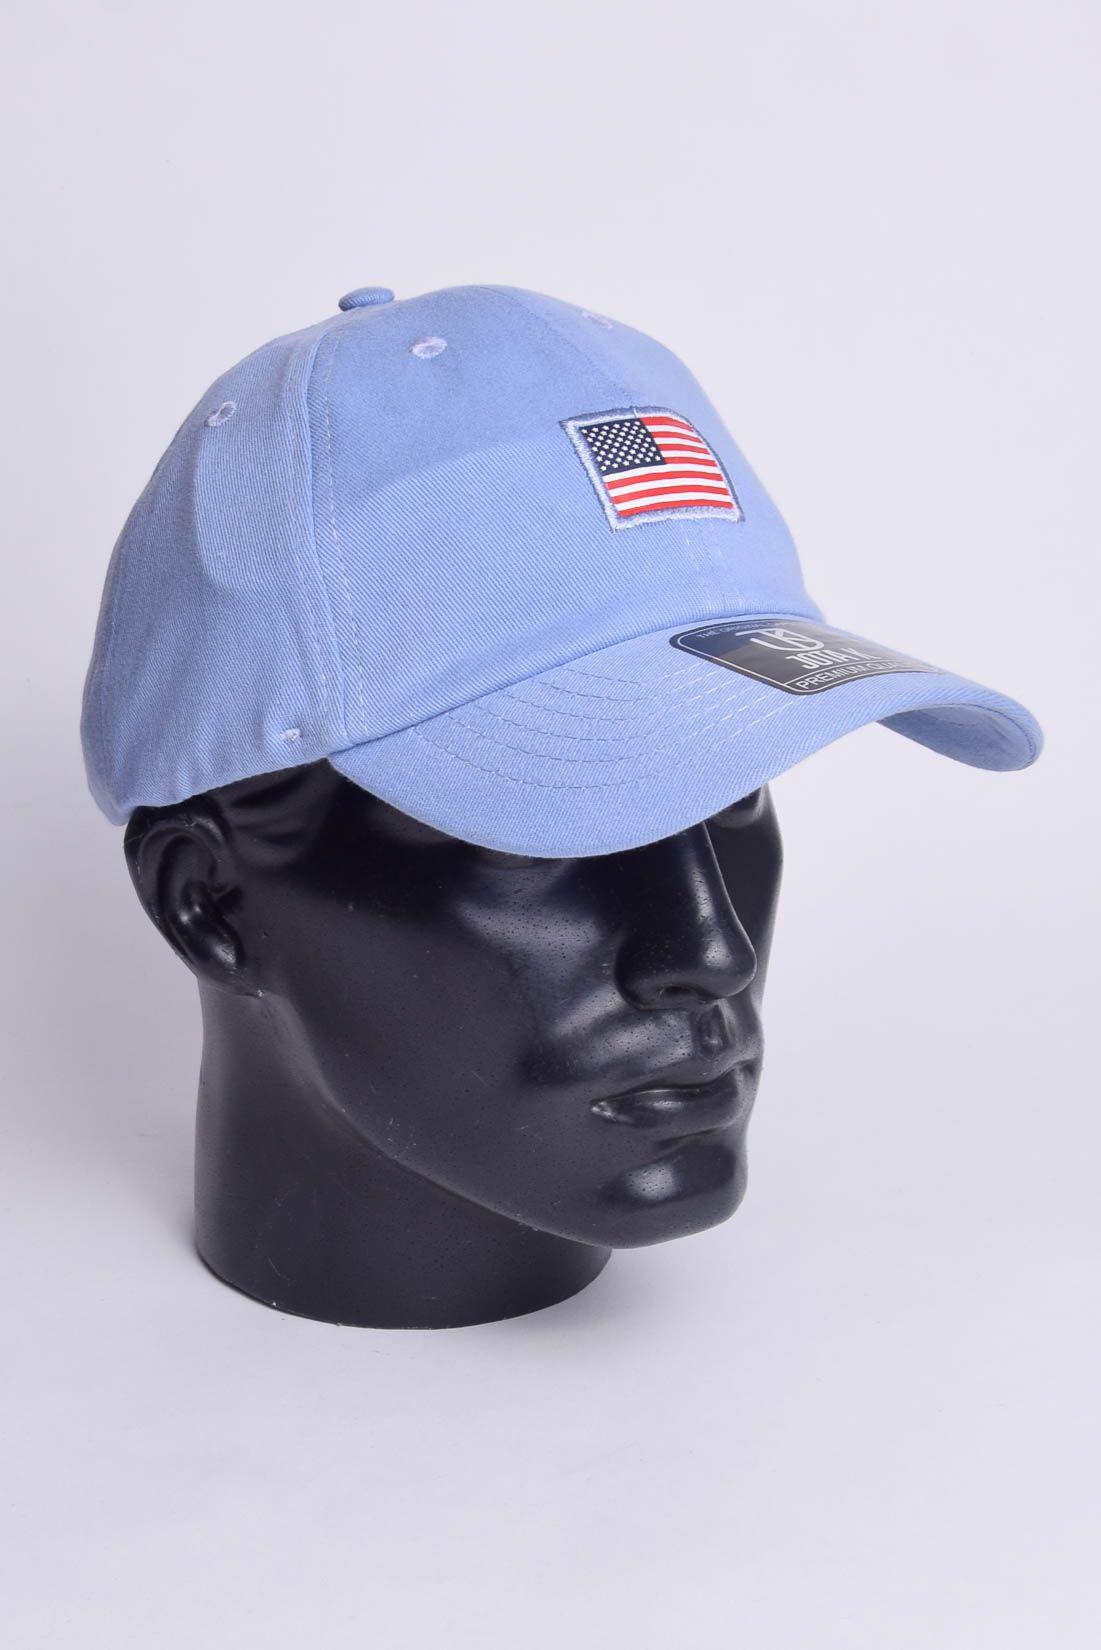 Boné EUA Strapback Dad Hat Aba Curva  Jota K